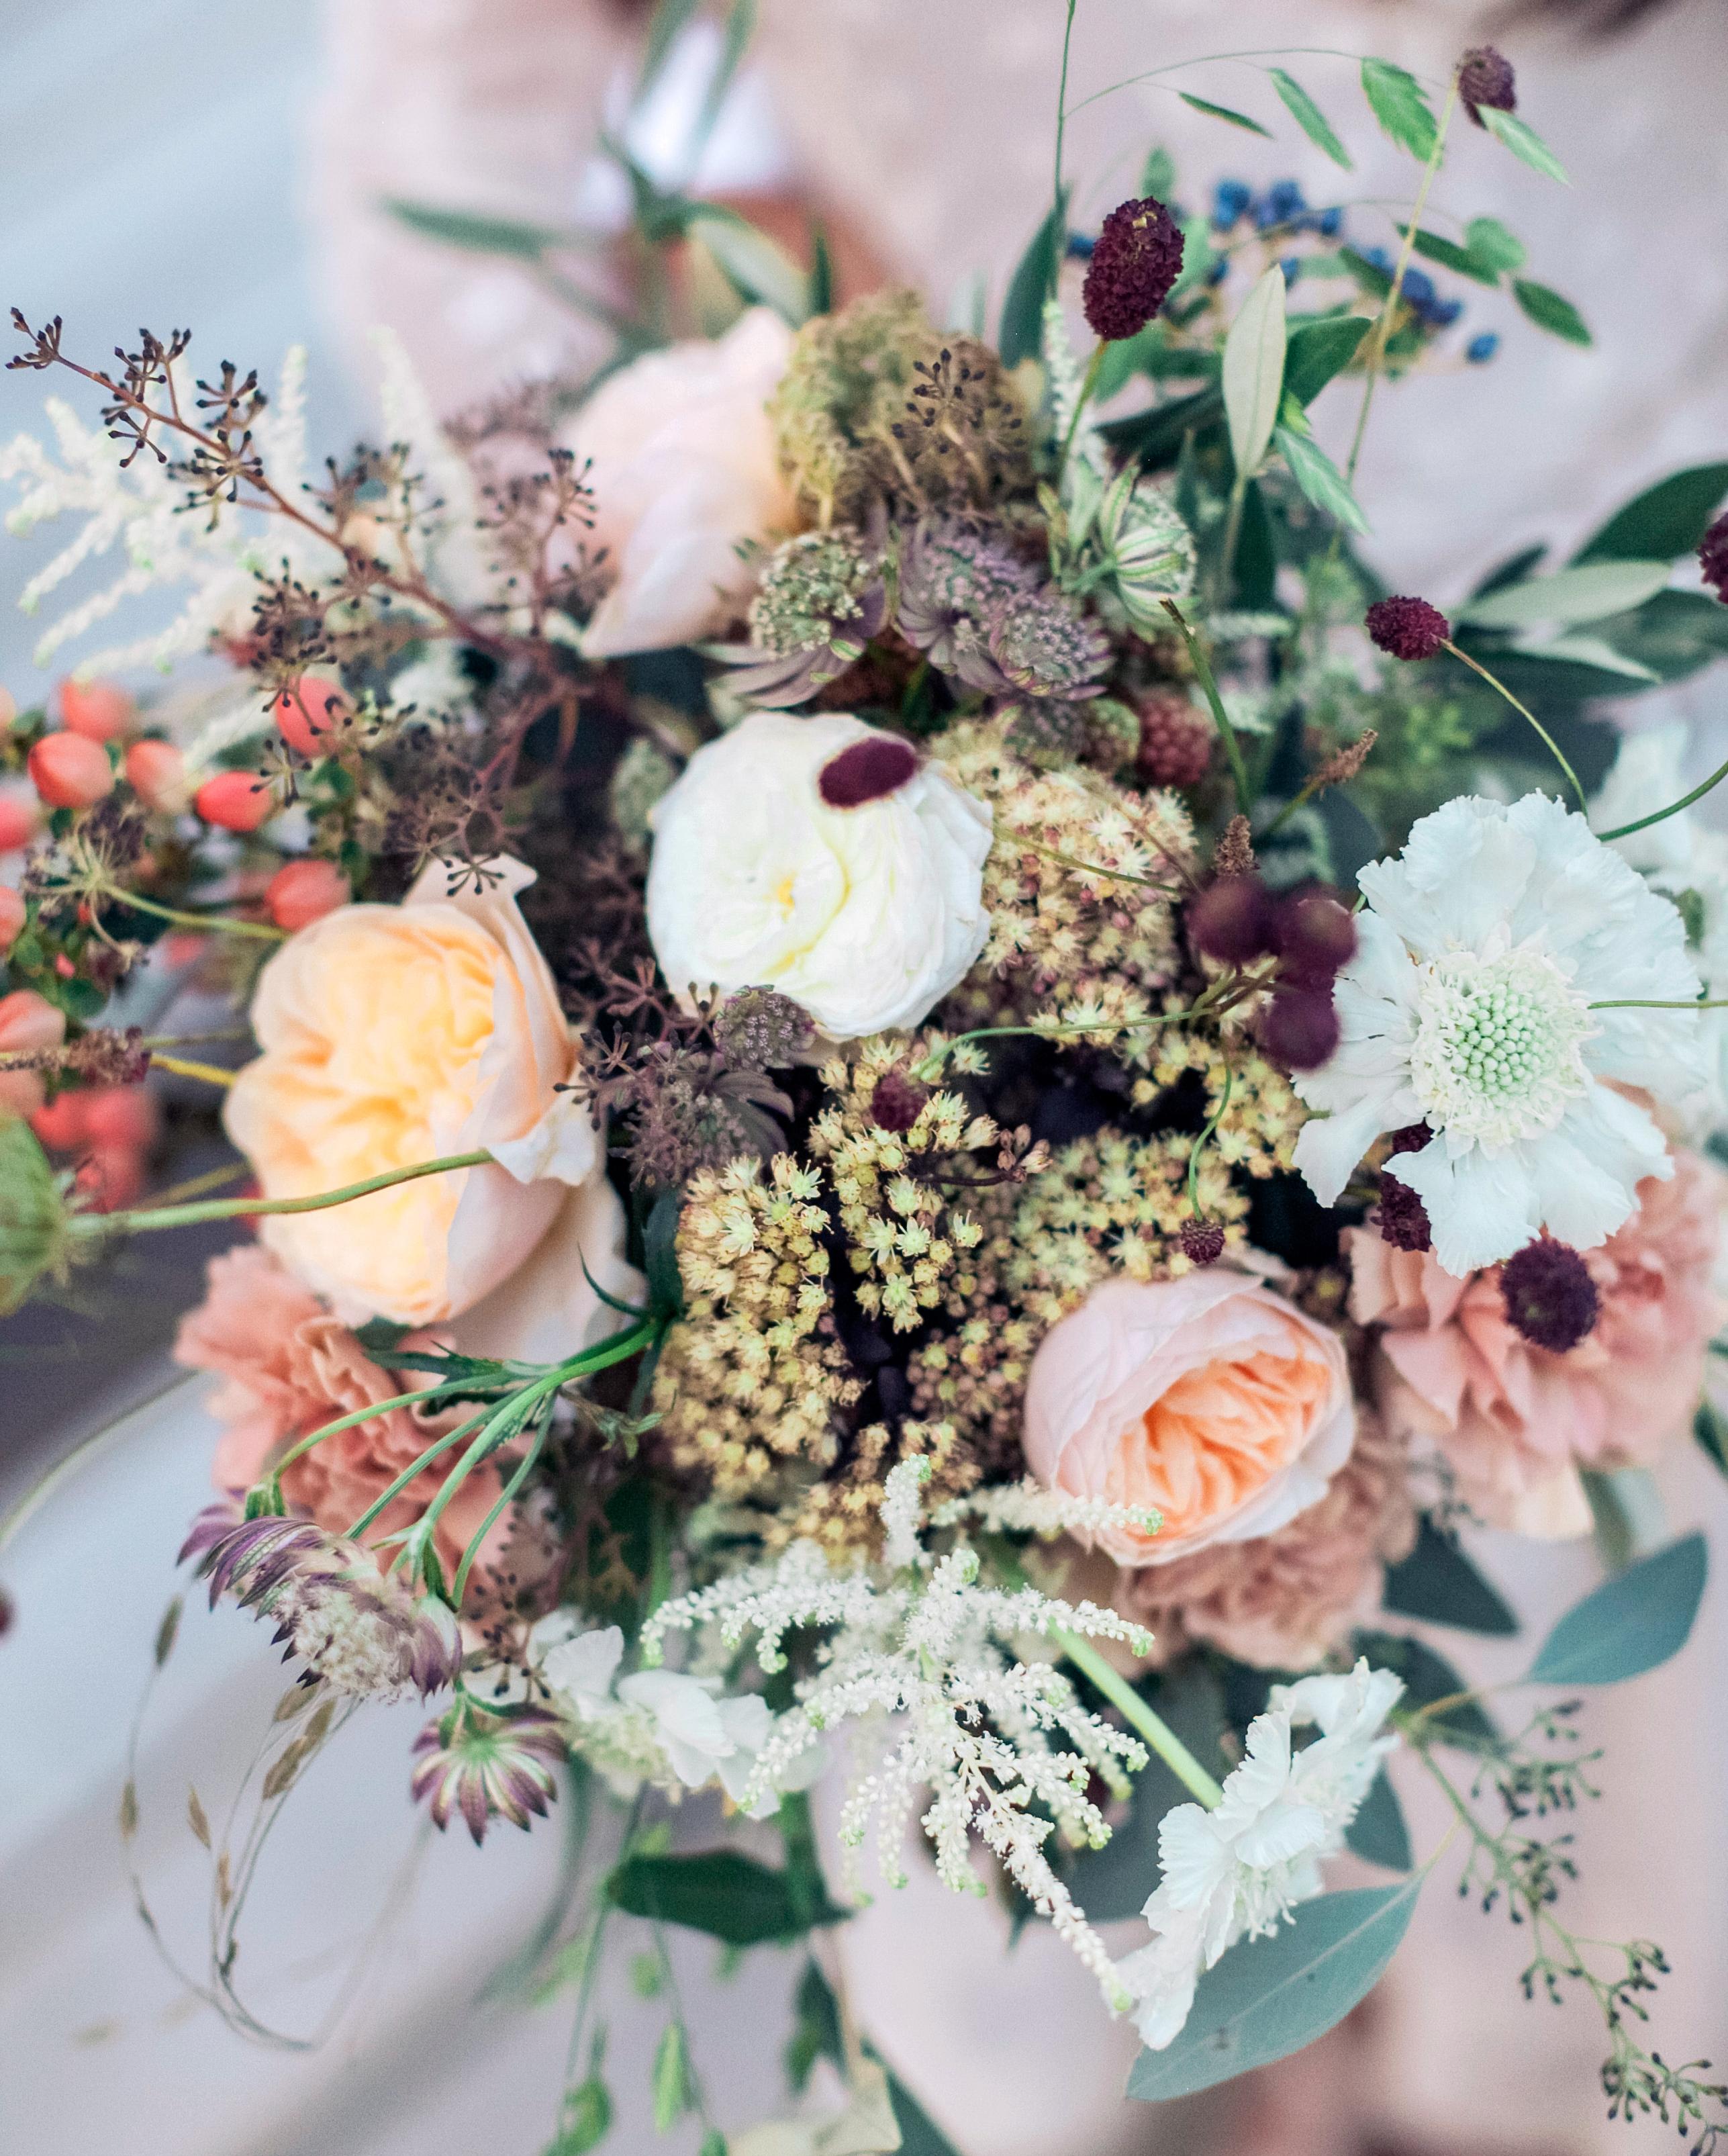 negin-chris-wedding-bouquet-0982-s112116-0815.jpg